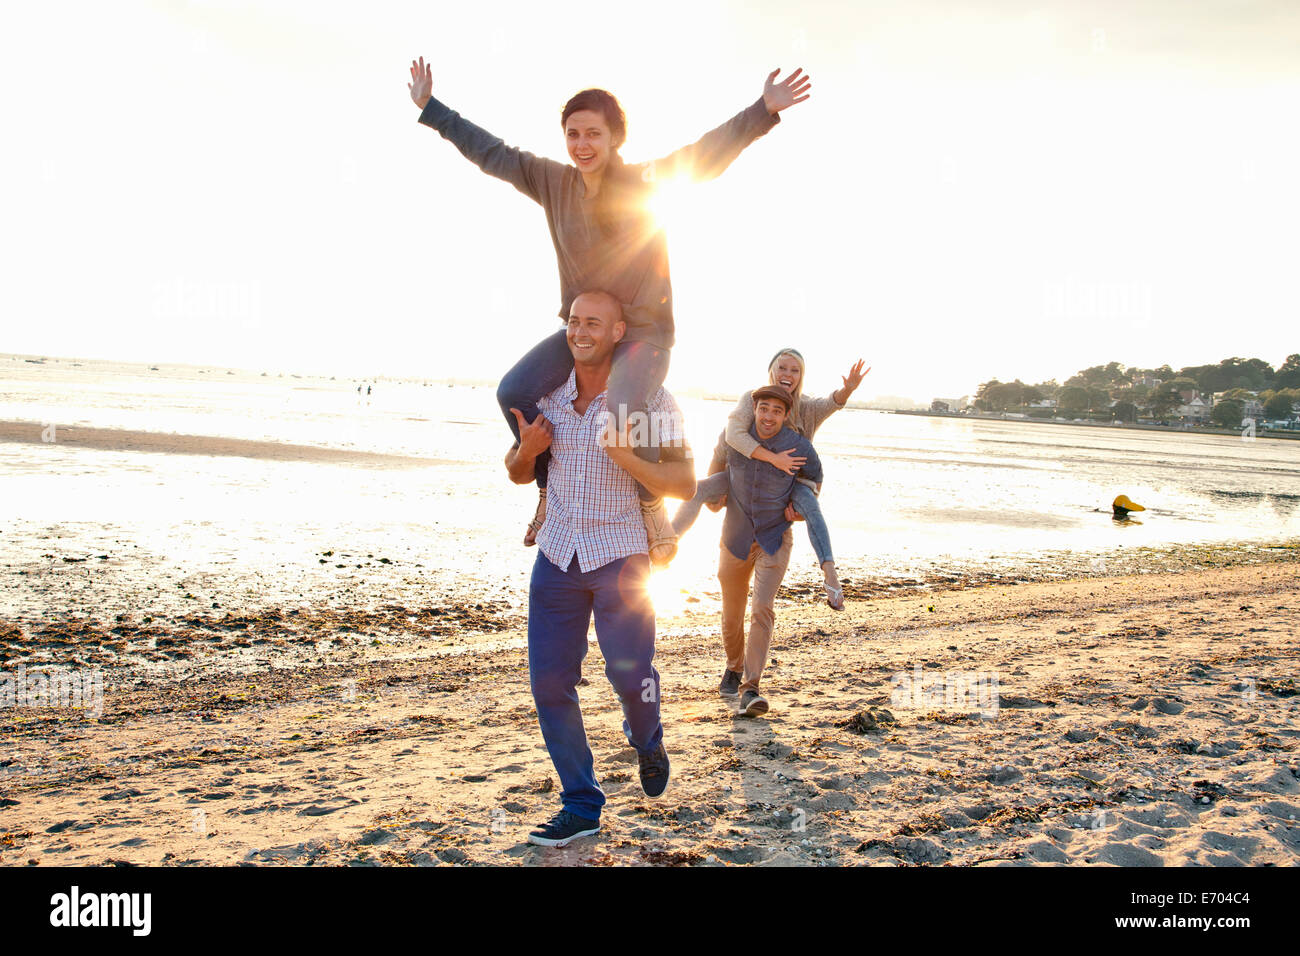 Men giving piggyback ride to women on beach Stock Photo